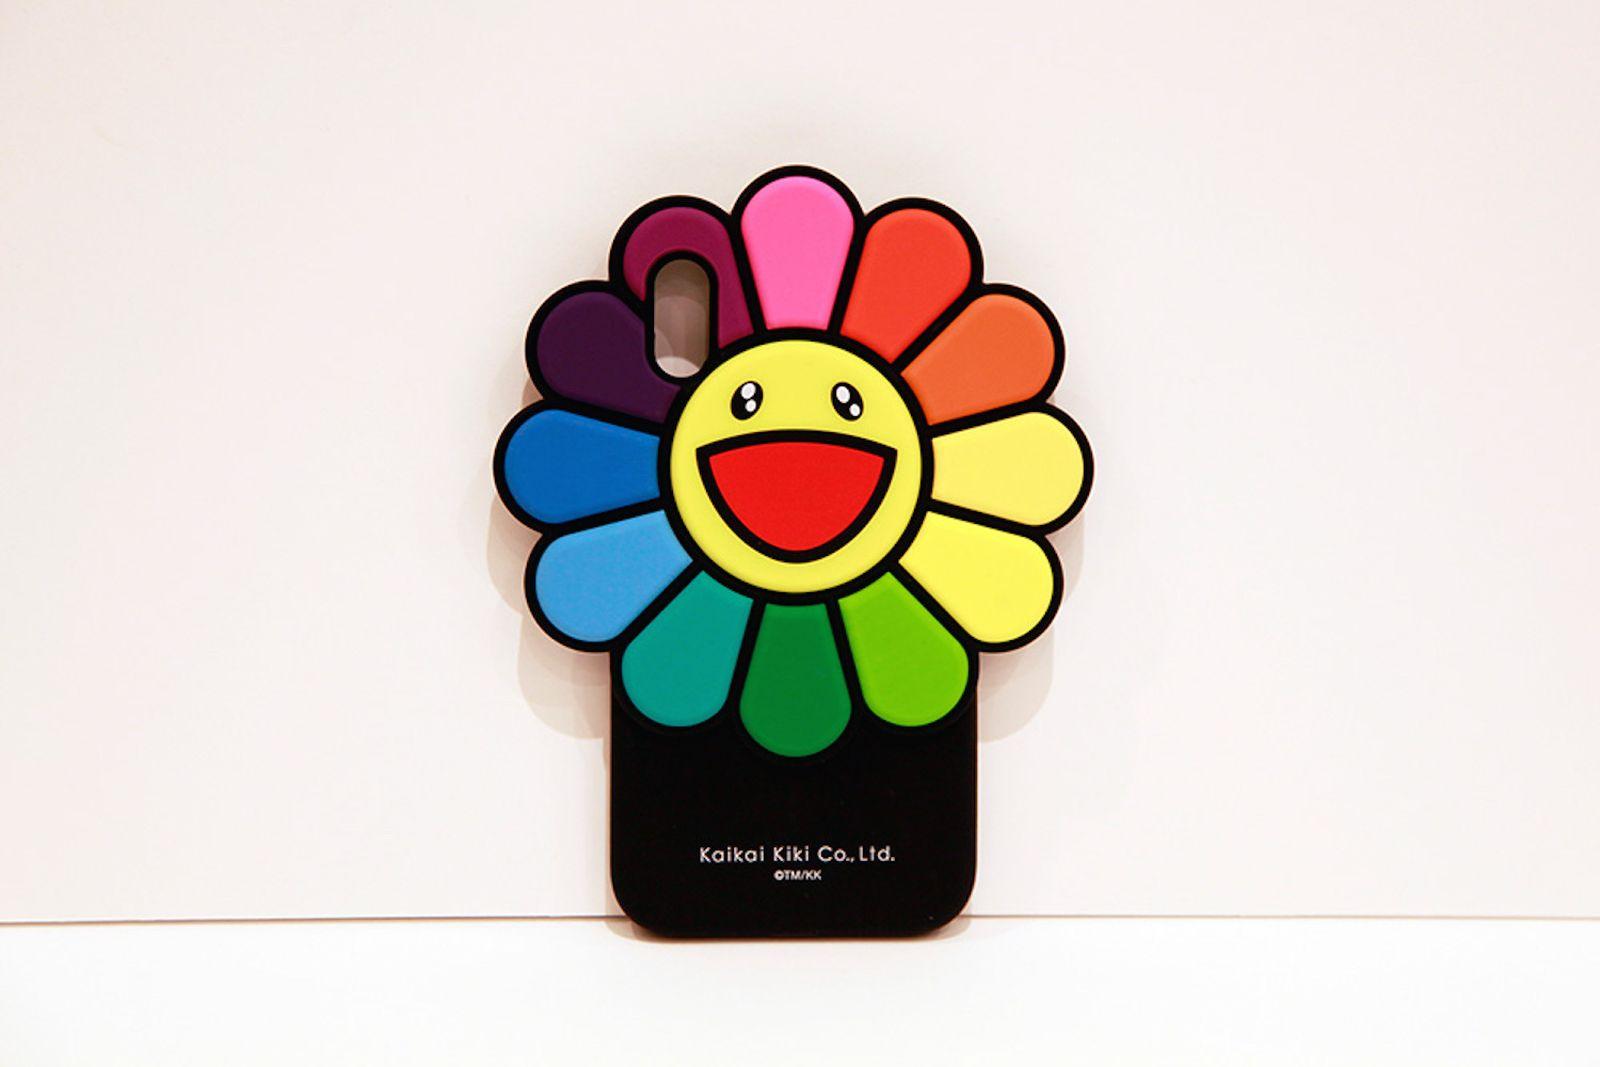 takashi murakami iphone cases iPhone XR iPhone XS